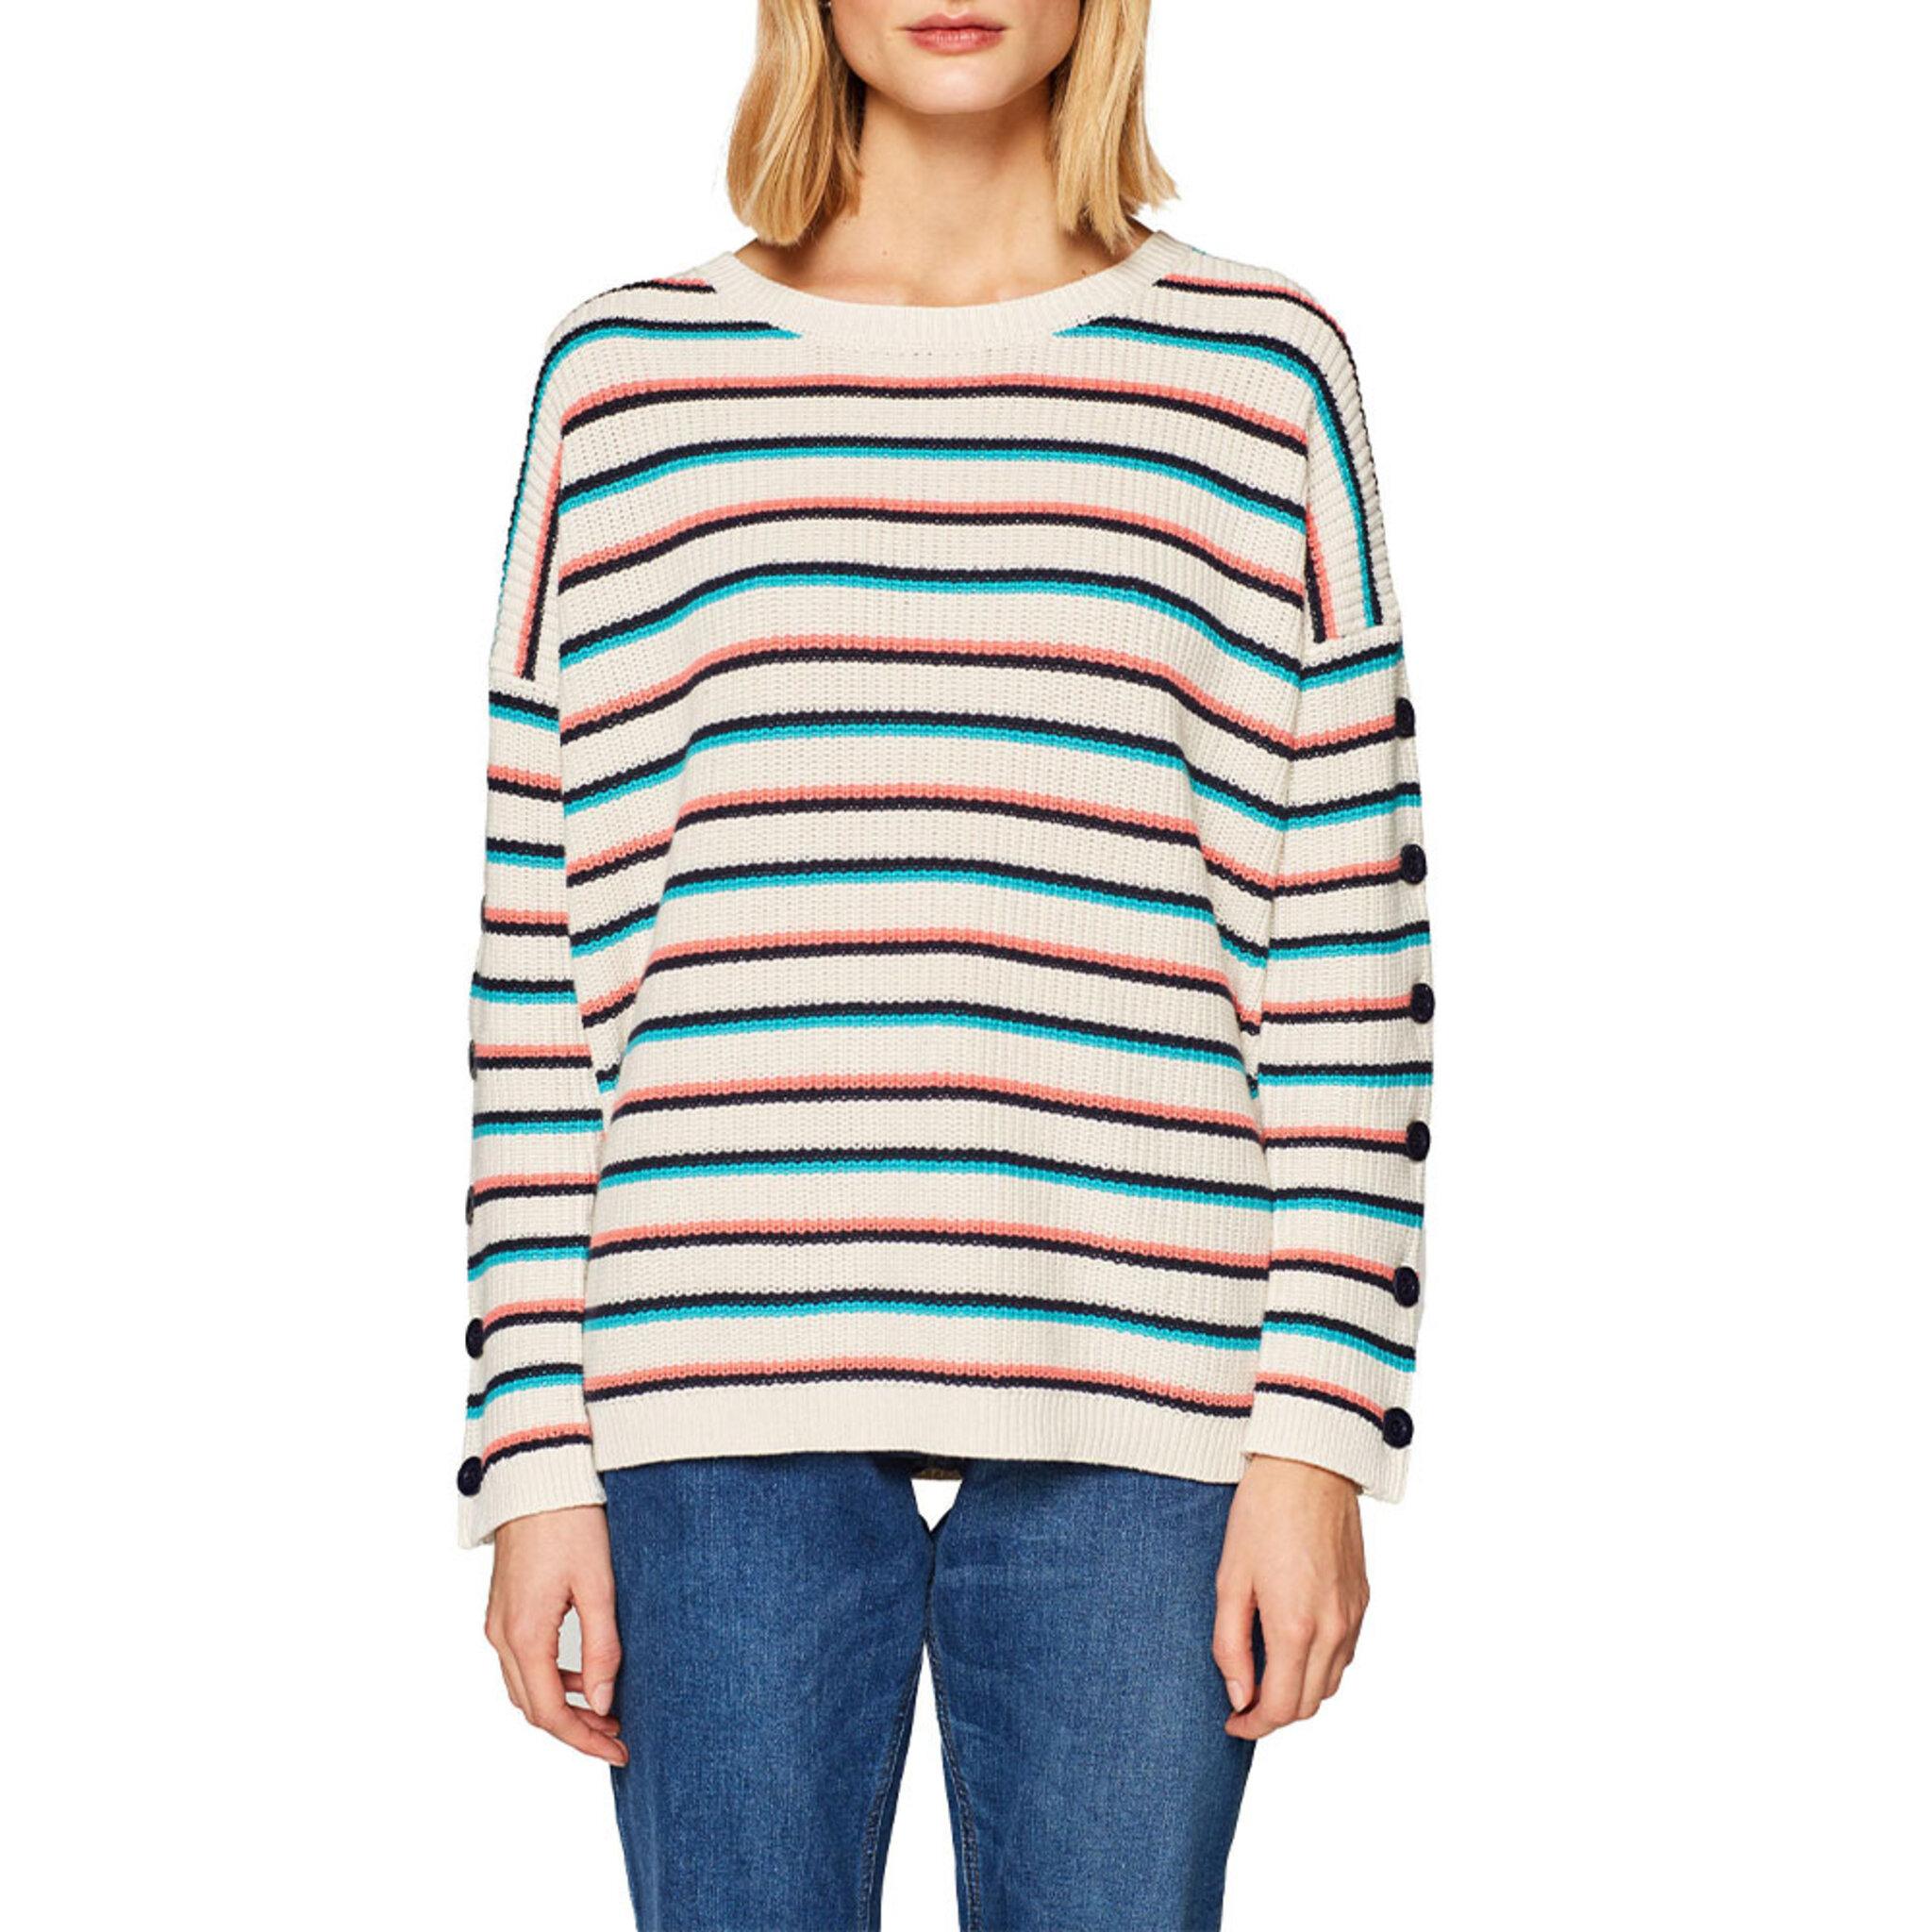 Odd Molly, Kjol, Strl: S, 066, Soft Pace Skirt, Grå, Kashmir